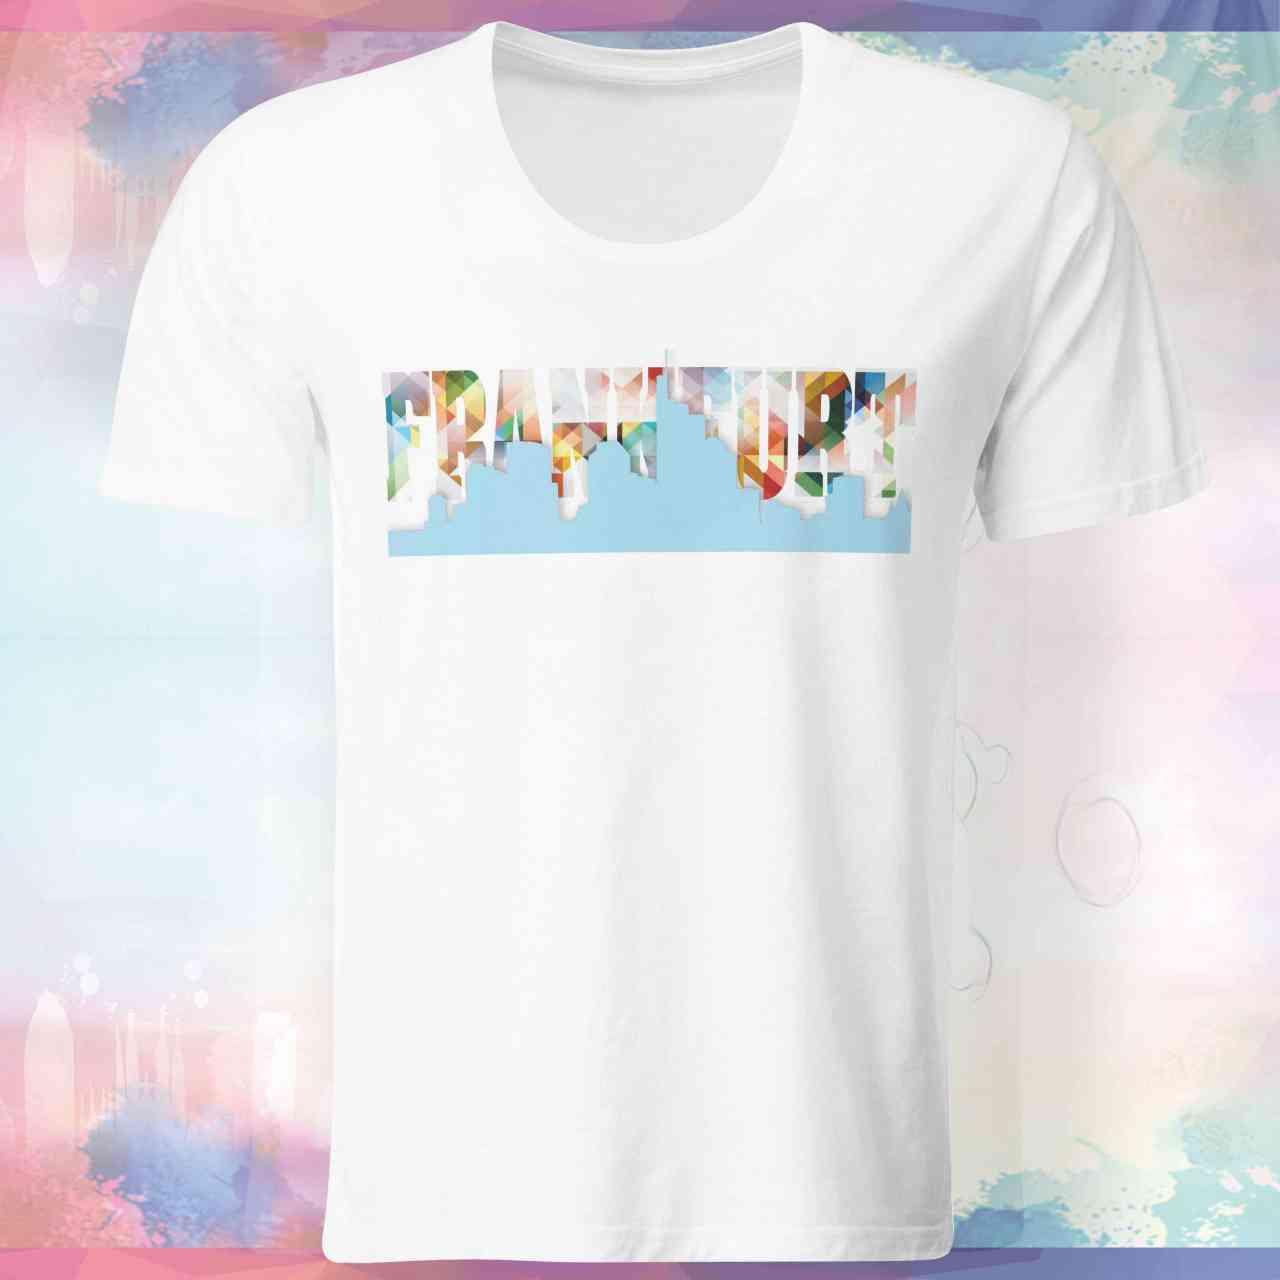 Frankfurt Skyline Shirt | Frankfurt Skyline T-Shirt | Frankfurt Skyline Tshirt